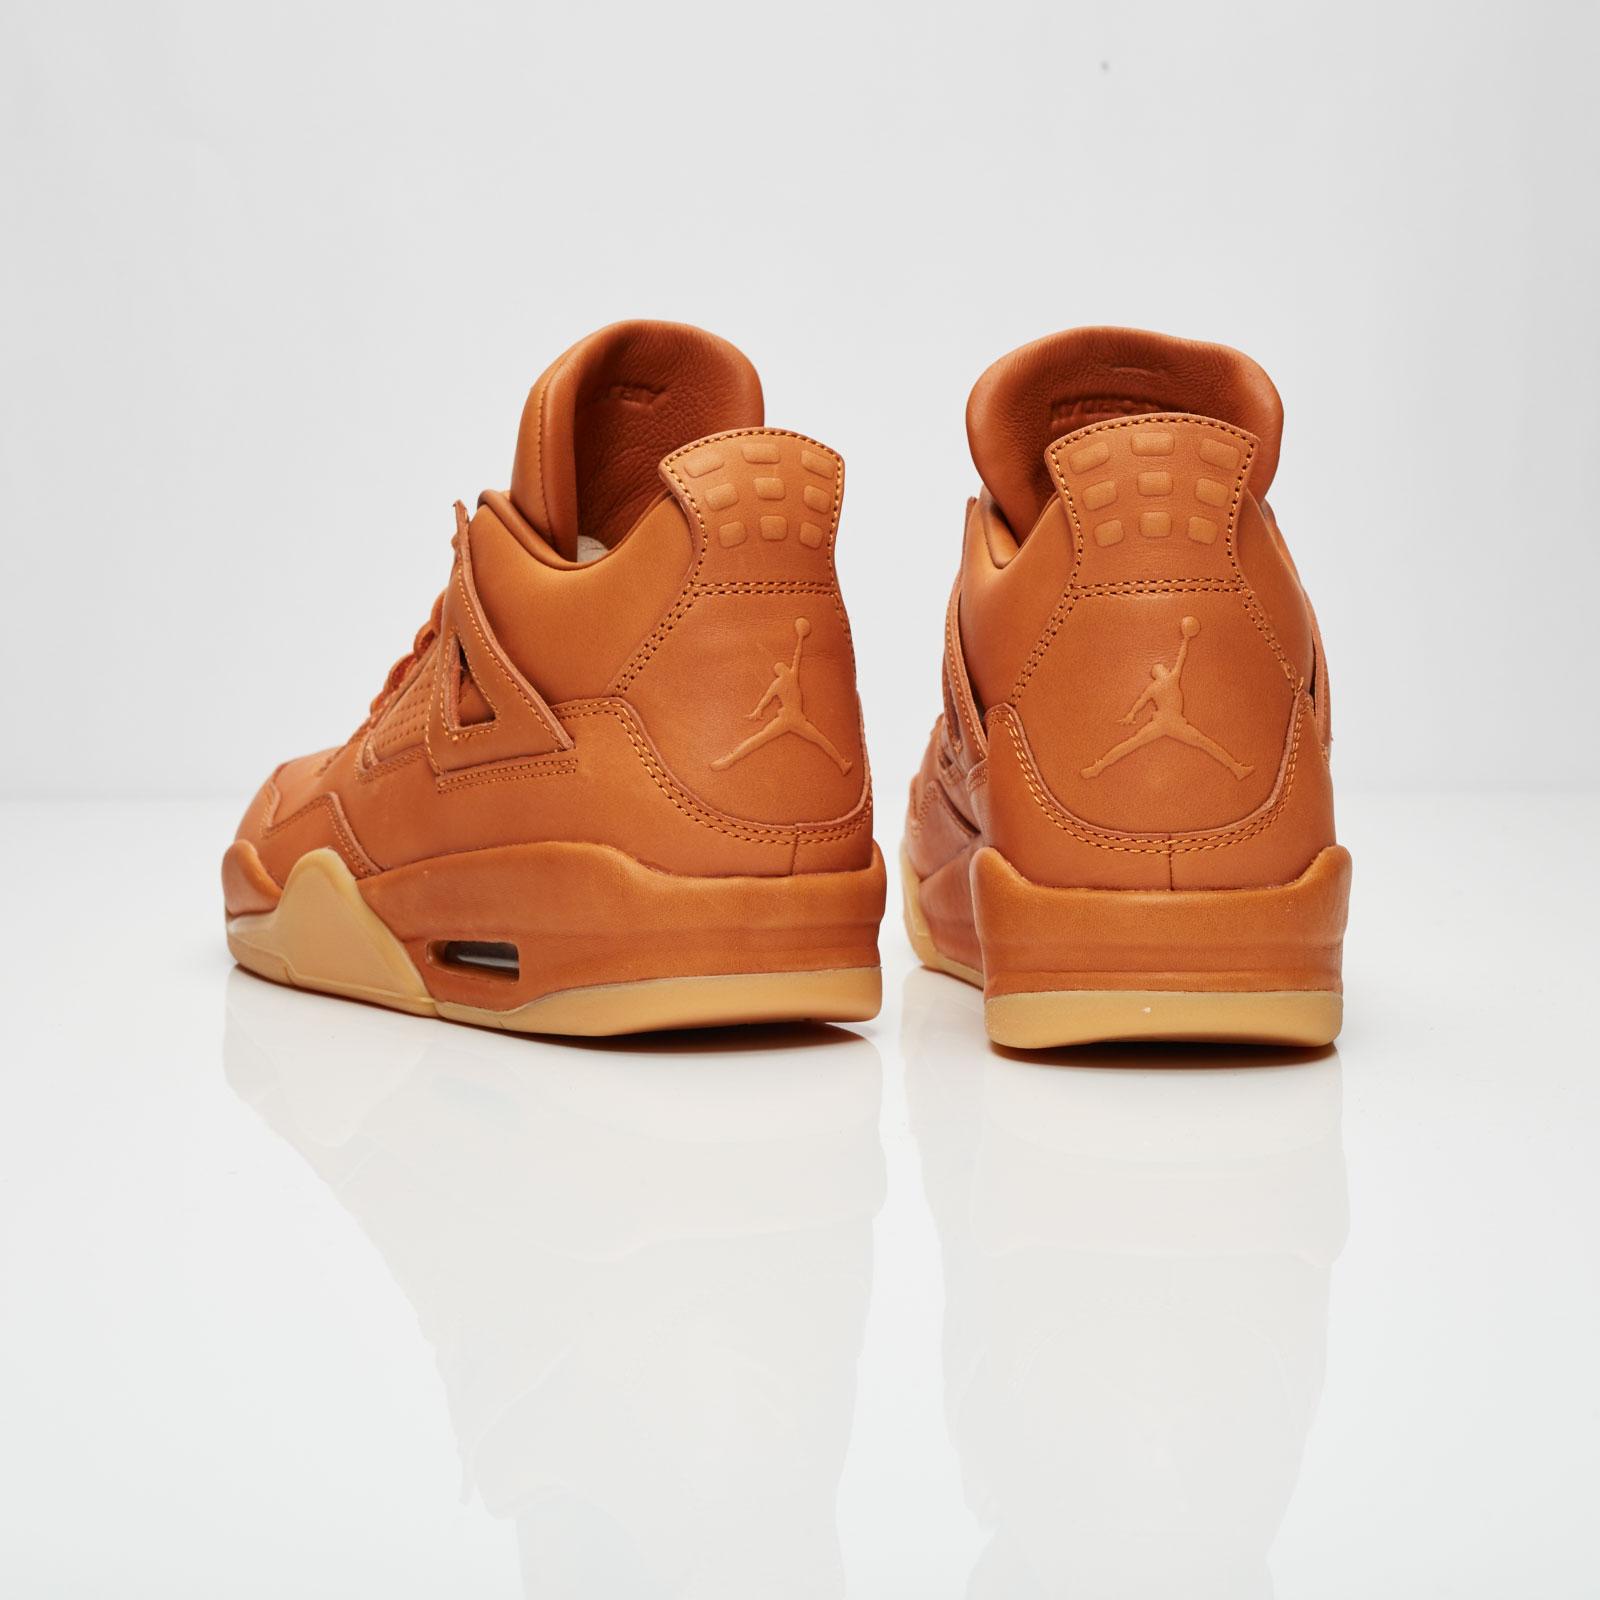 watch 90e83 51bbc Jordan Brand Air Jordan 4 Retro Premium - 819139-205 - Sneakersnstuff    sneakers   streetwear på nätet sen 1999